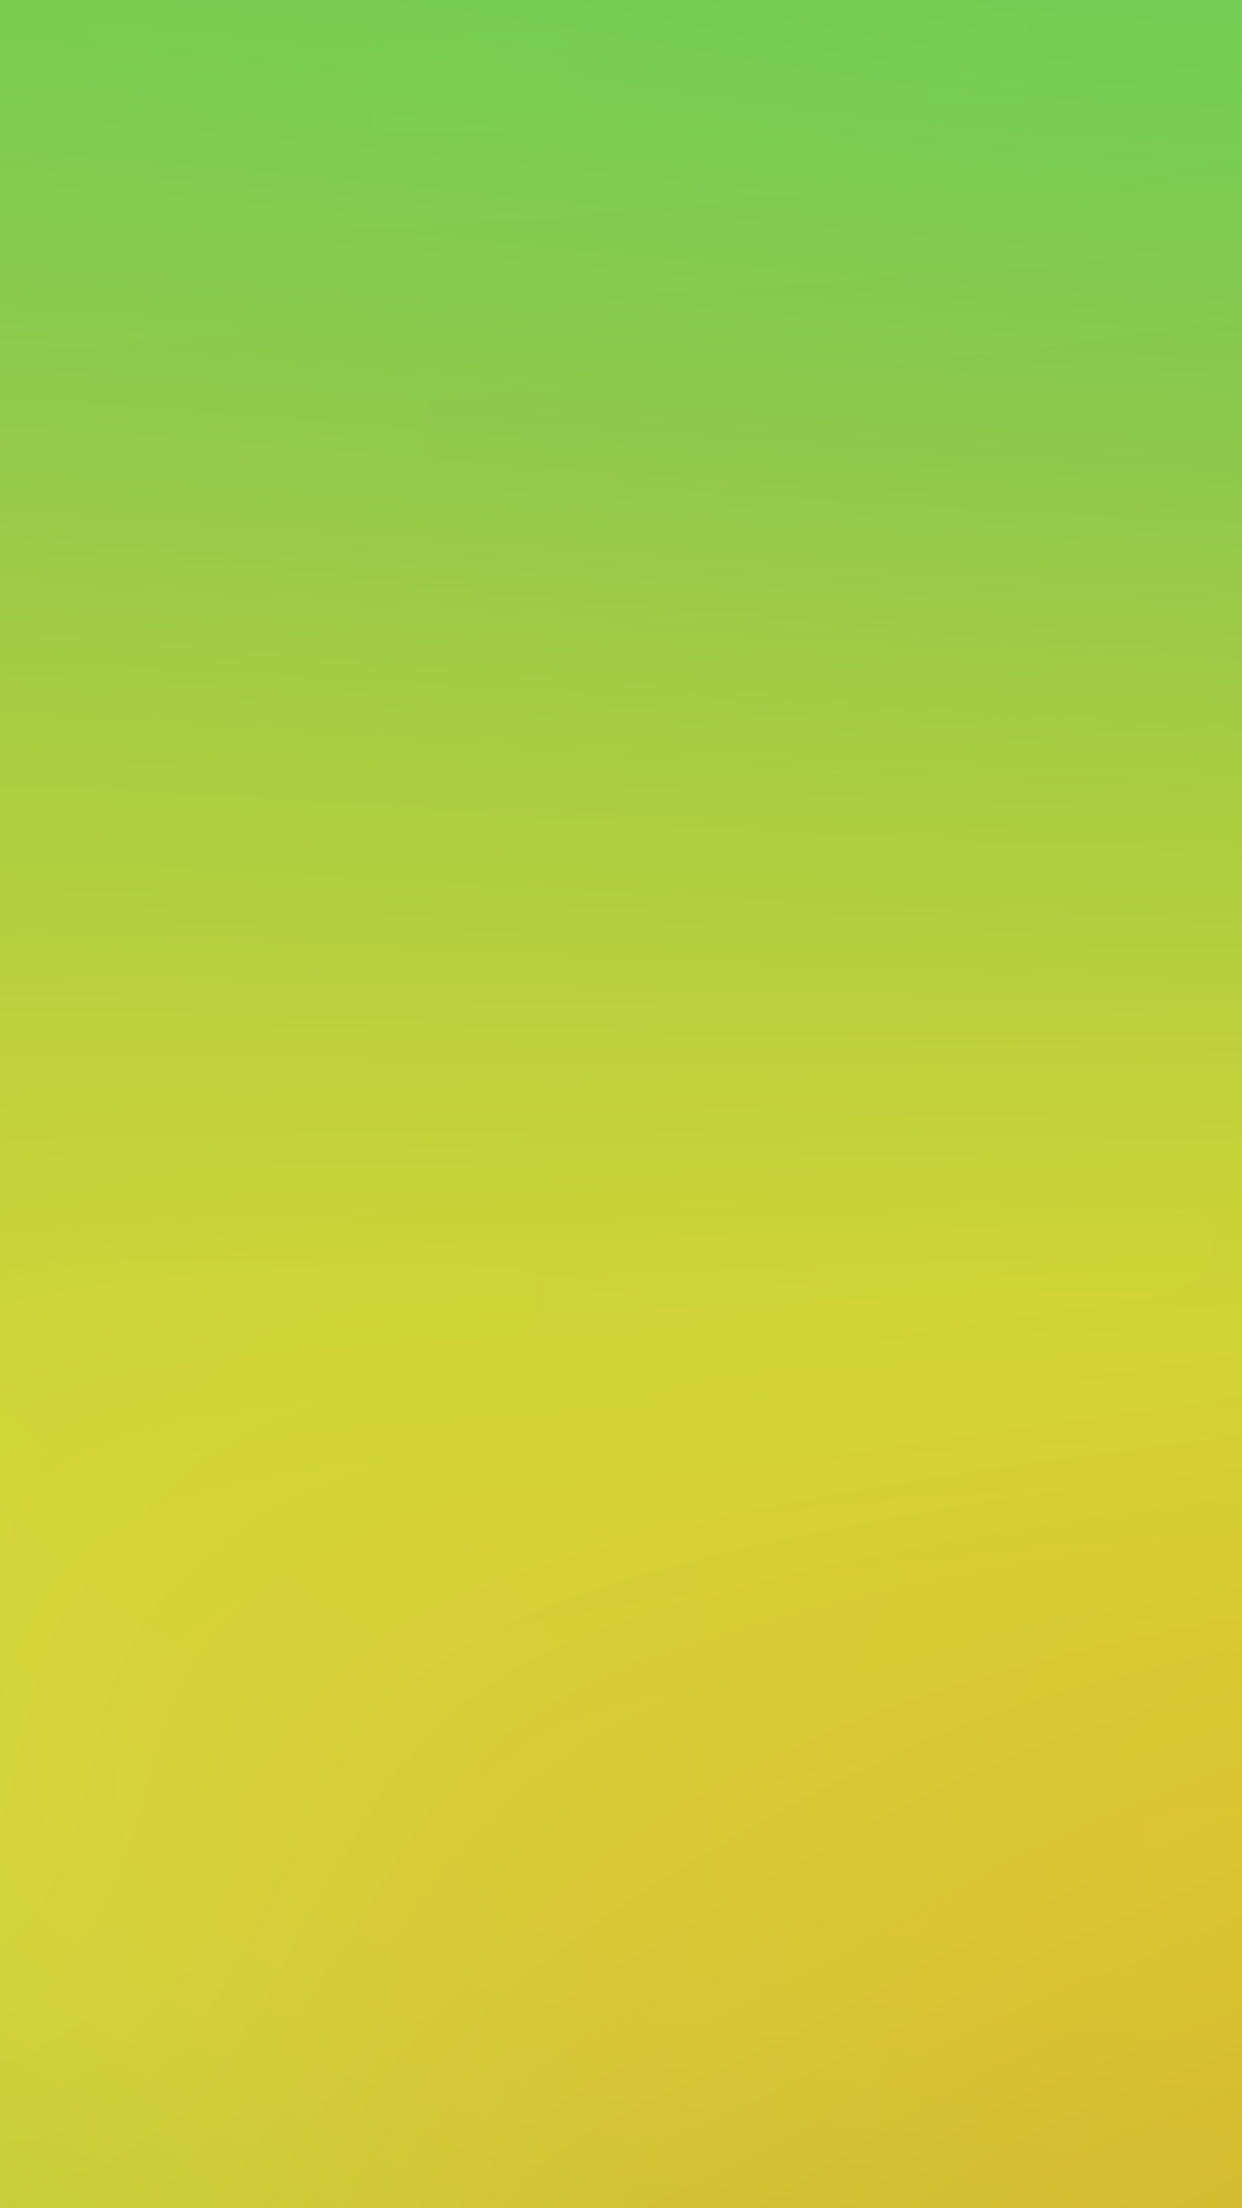 Free Fall Desktop Wallpaper For Mac Iphone X